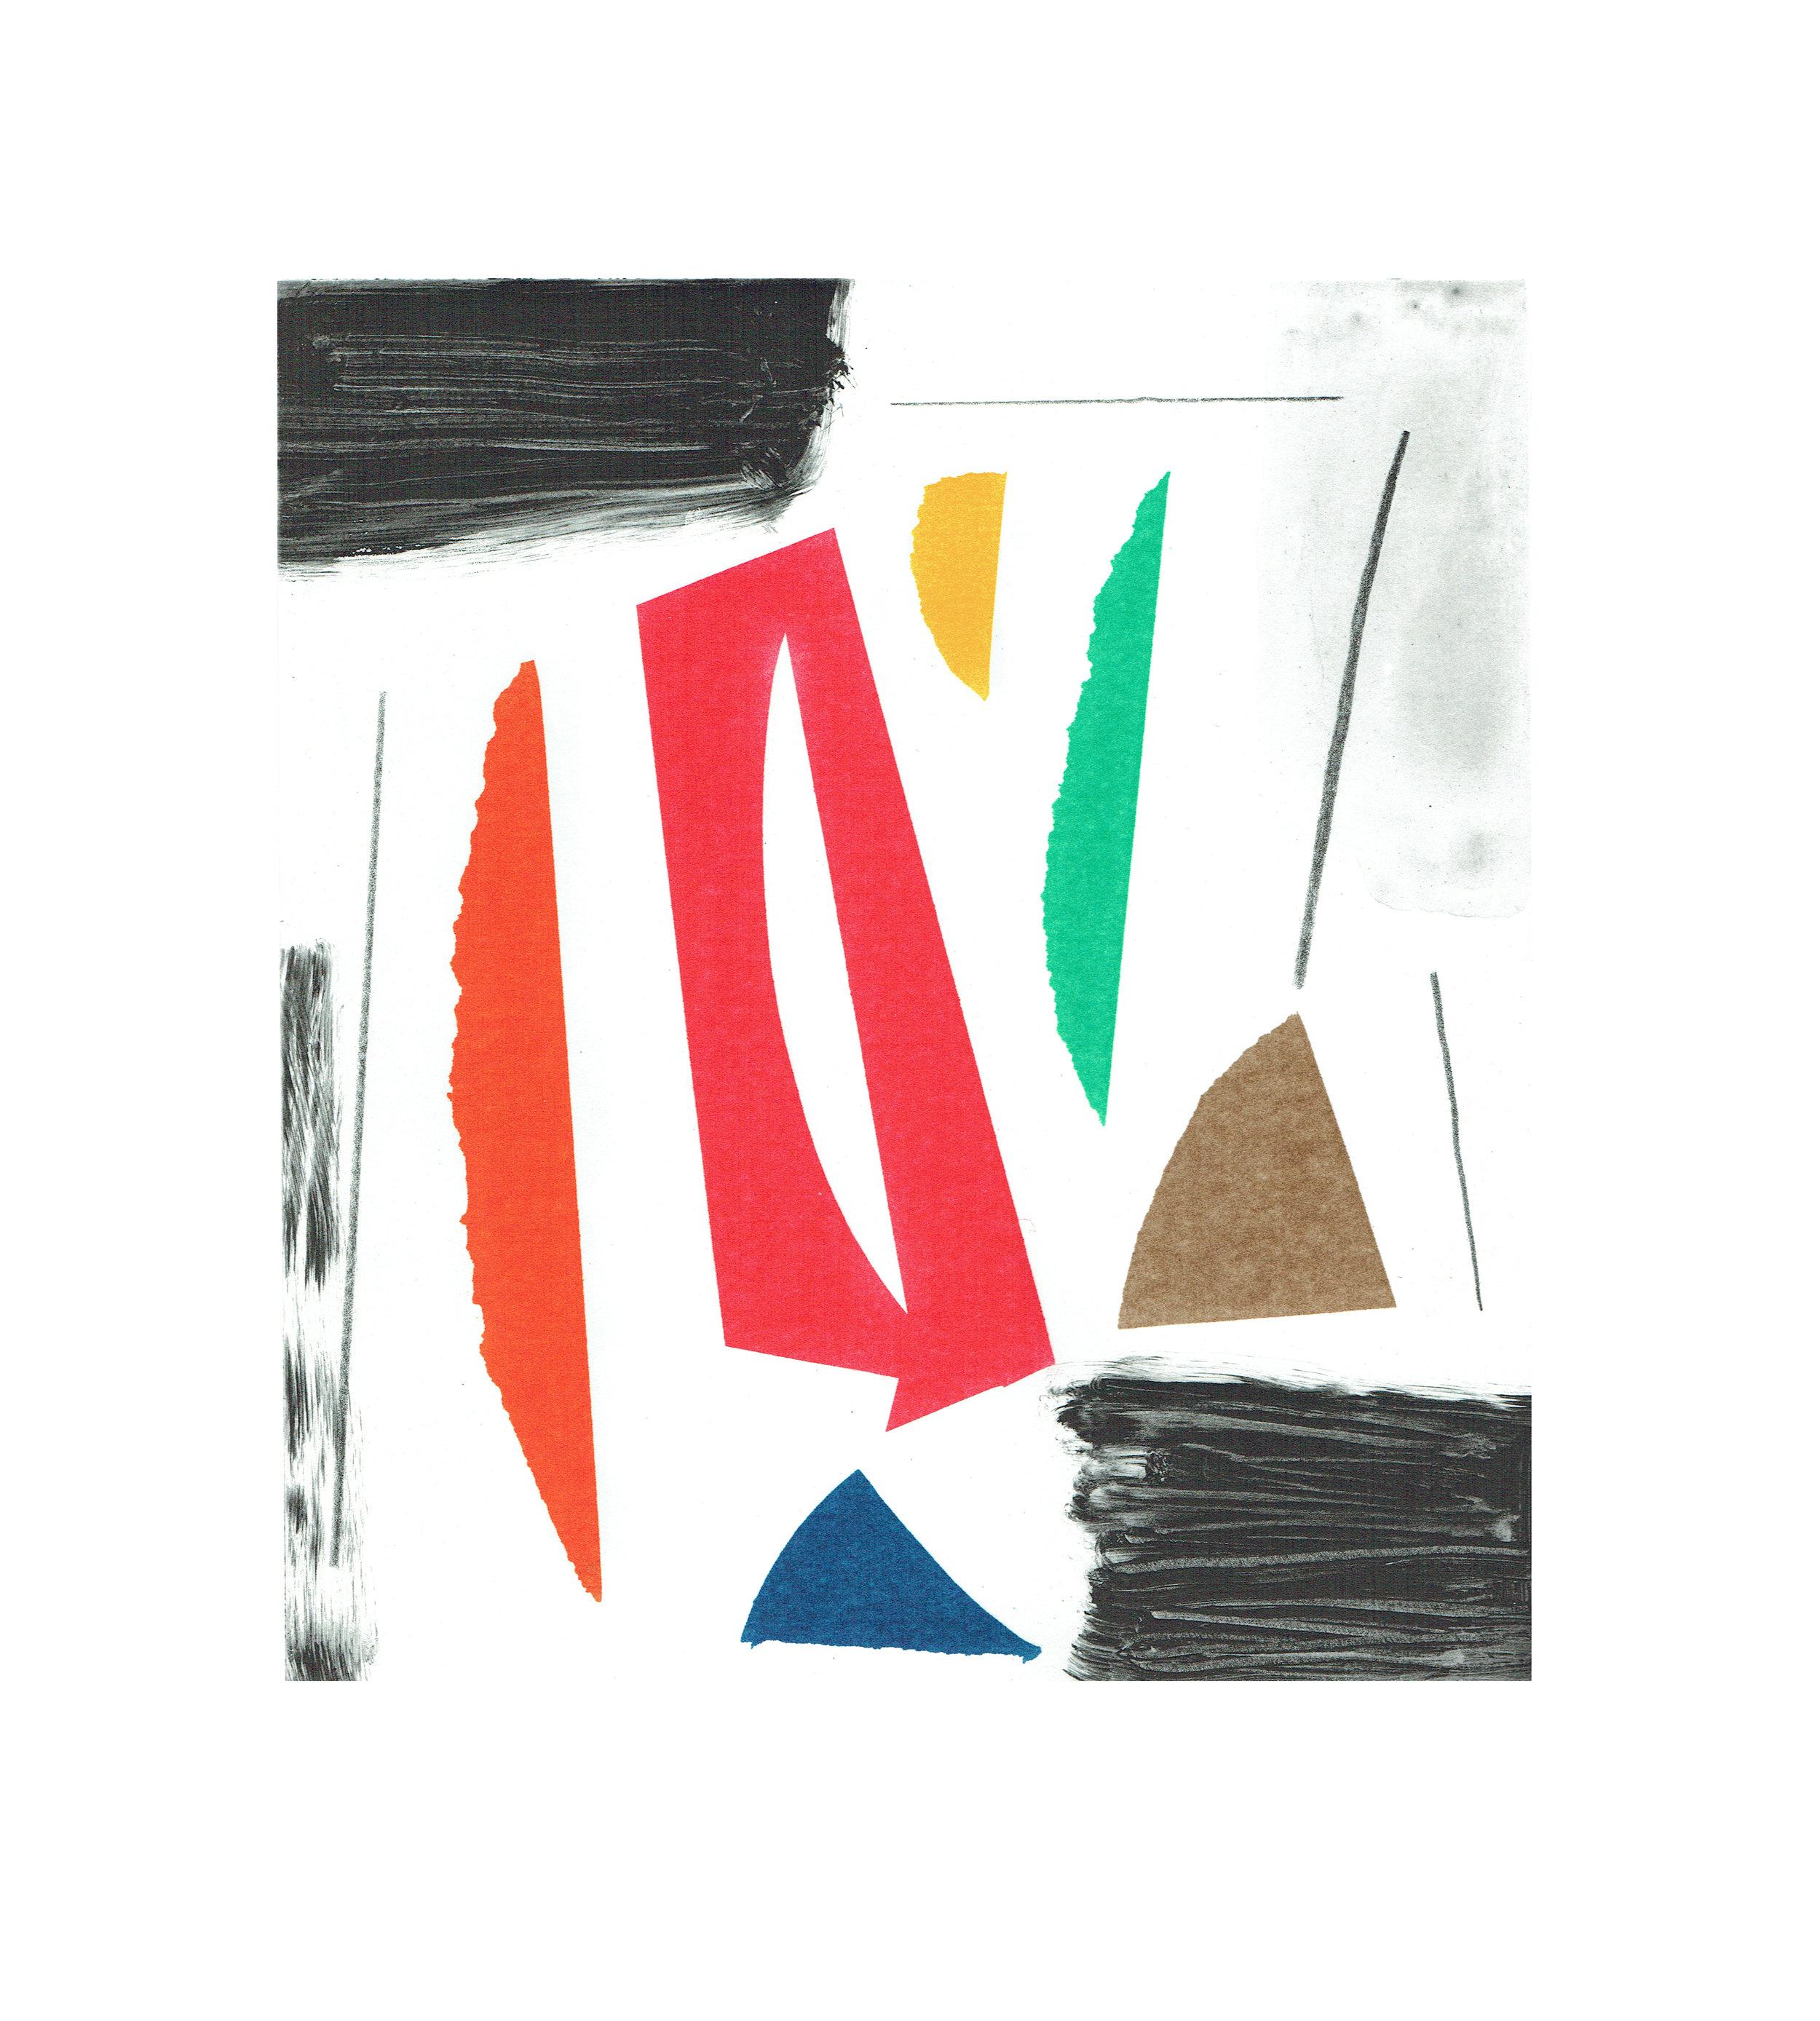 John McLean, Merry Go Round 5    Date: 2016  Size (cm - unframed):  38.2 x 34.4  Technique:  2 plate a la poupee etching  Materials:  Somerset Valvet 300gsm  Edition size:  20  Publisher: The Print Studio  Copyright: The Artist   POA